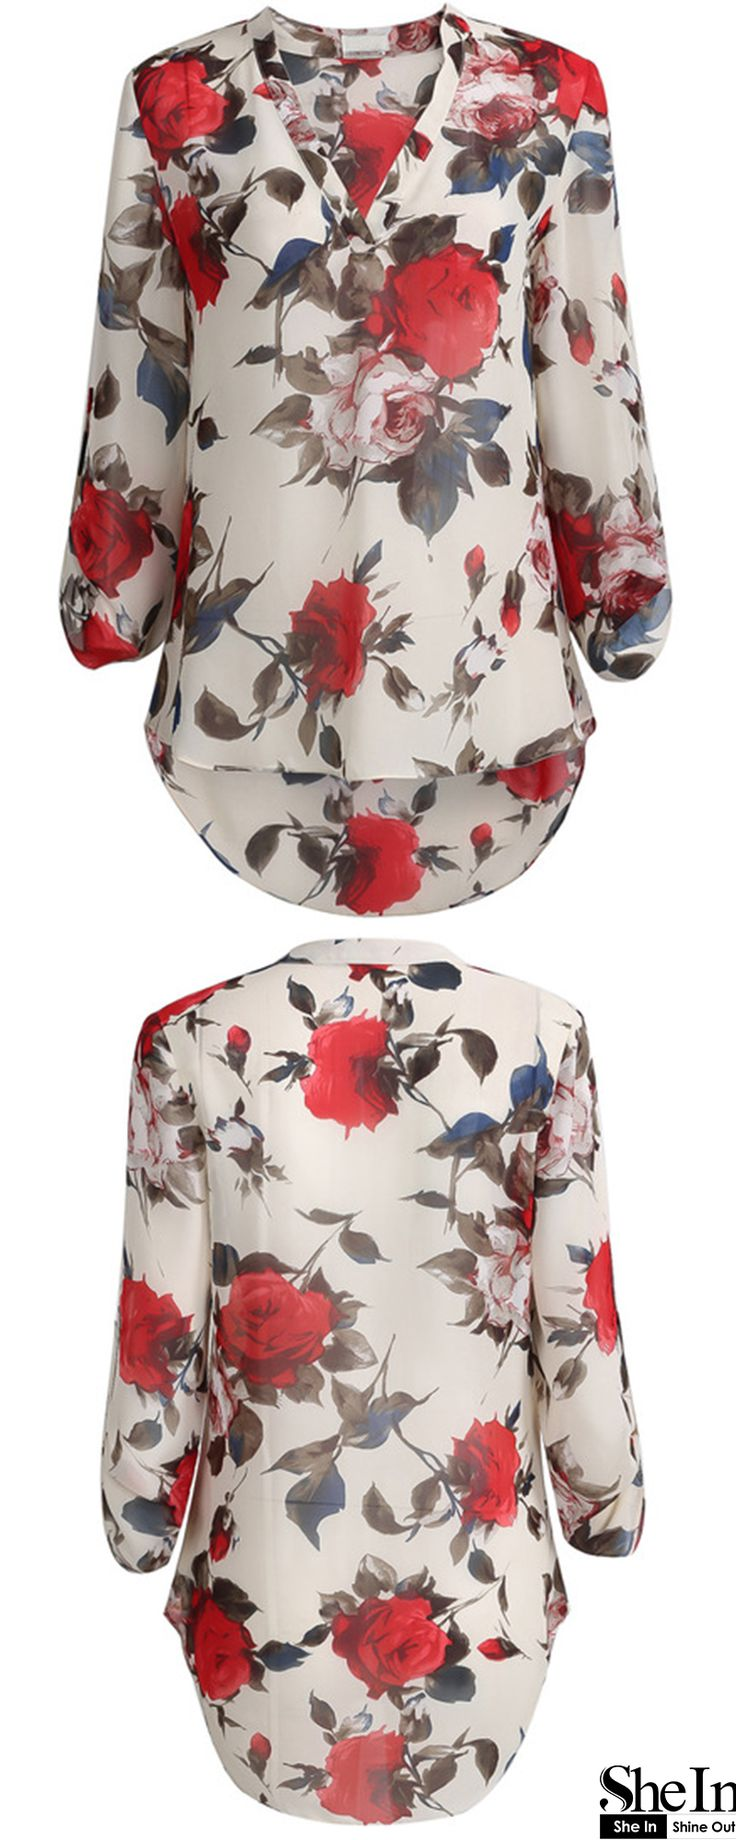 Apricot Long Sleeve Floral Print BlouseApricot Long Sleeve Floral Print Blouse ONLY US$15.39 SHEIN